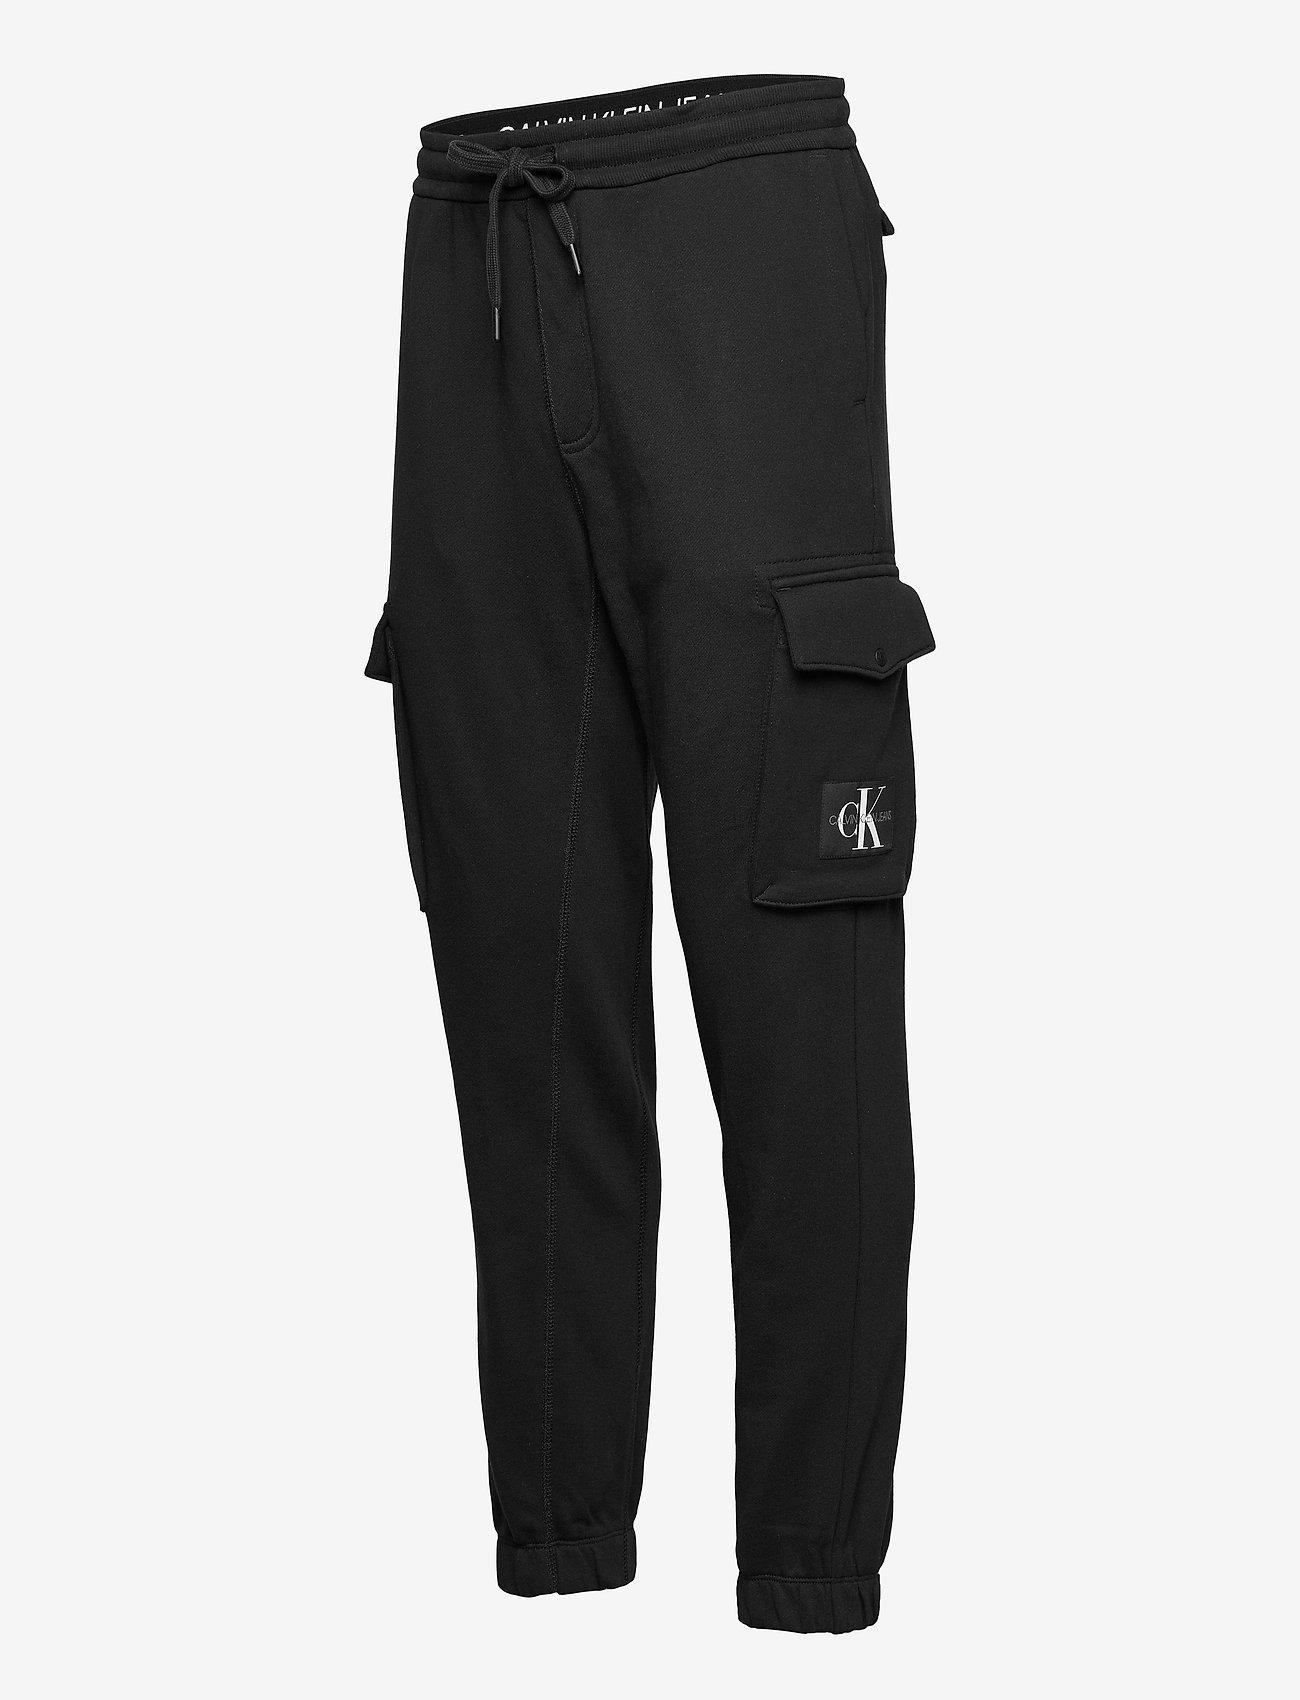 Calvin Klein Jeans - CARGO BADGE FLEECE PANT - cargobroek - ck black - 2